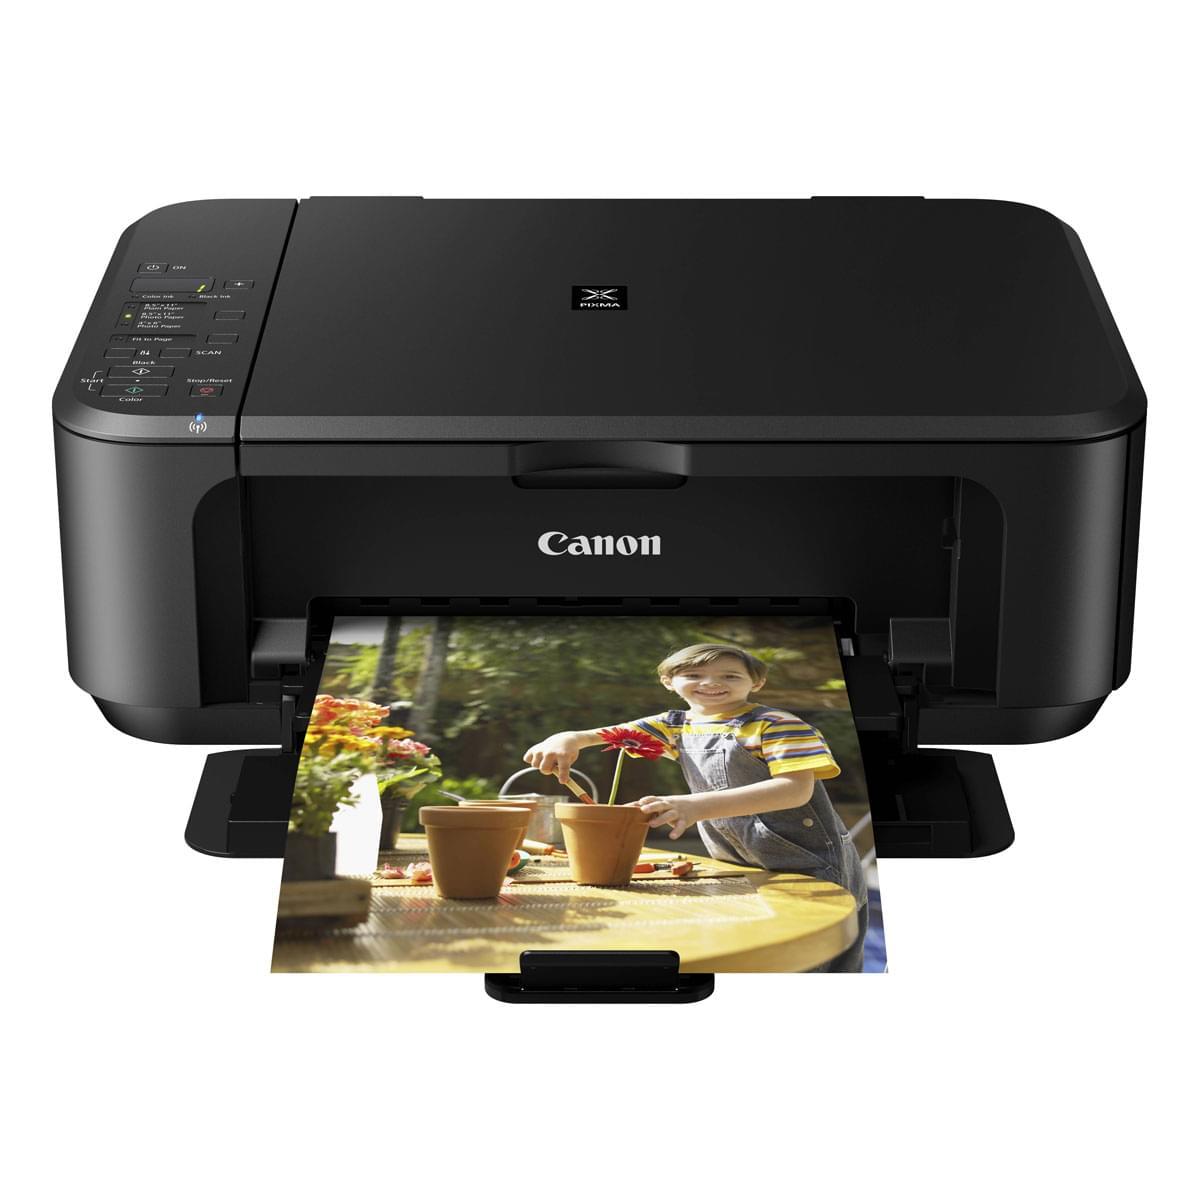 Canon PIXMA MG3250 (Recto-Verso/ WI-FI) (6223B006 obso) - Achat / Vente Imprimante Multifonction sur Cybertek.fr - 0